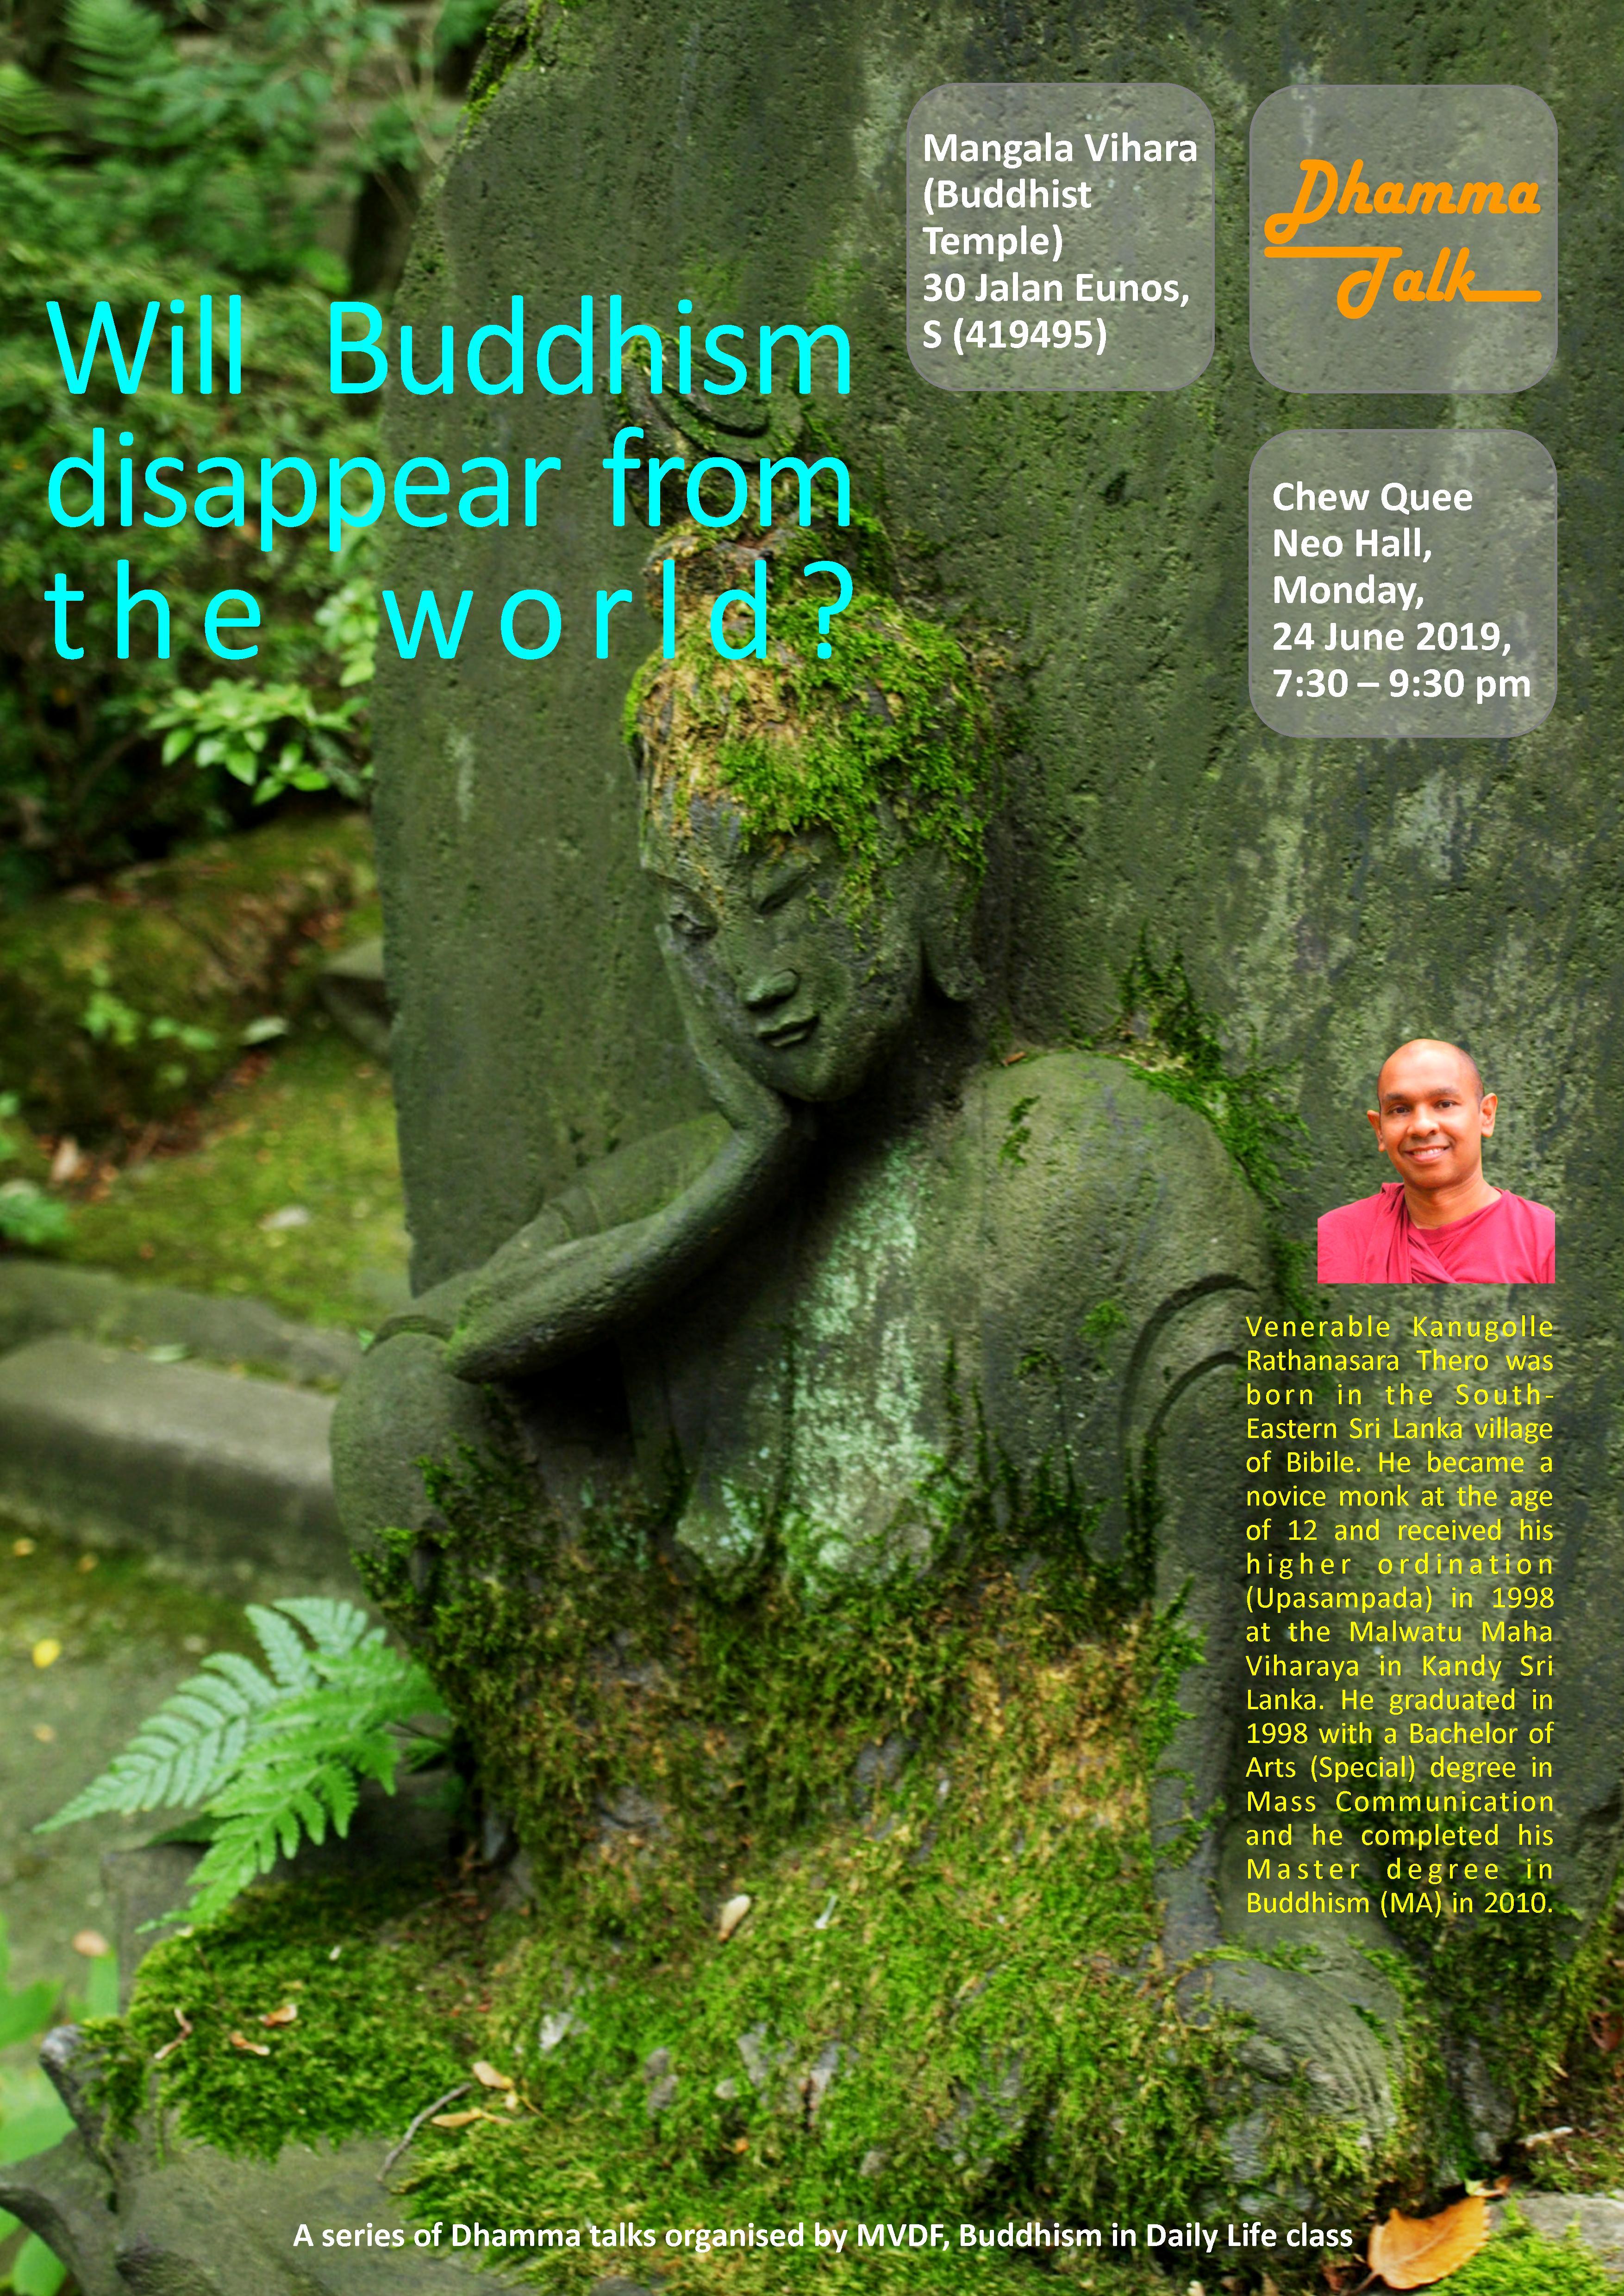 Dhamma Talks – Mangala Vihara